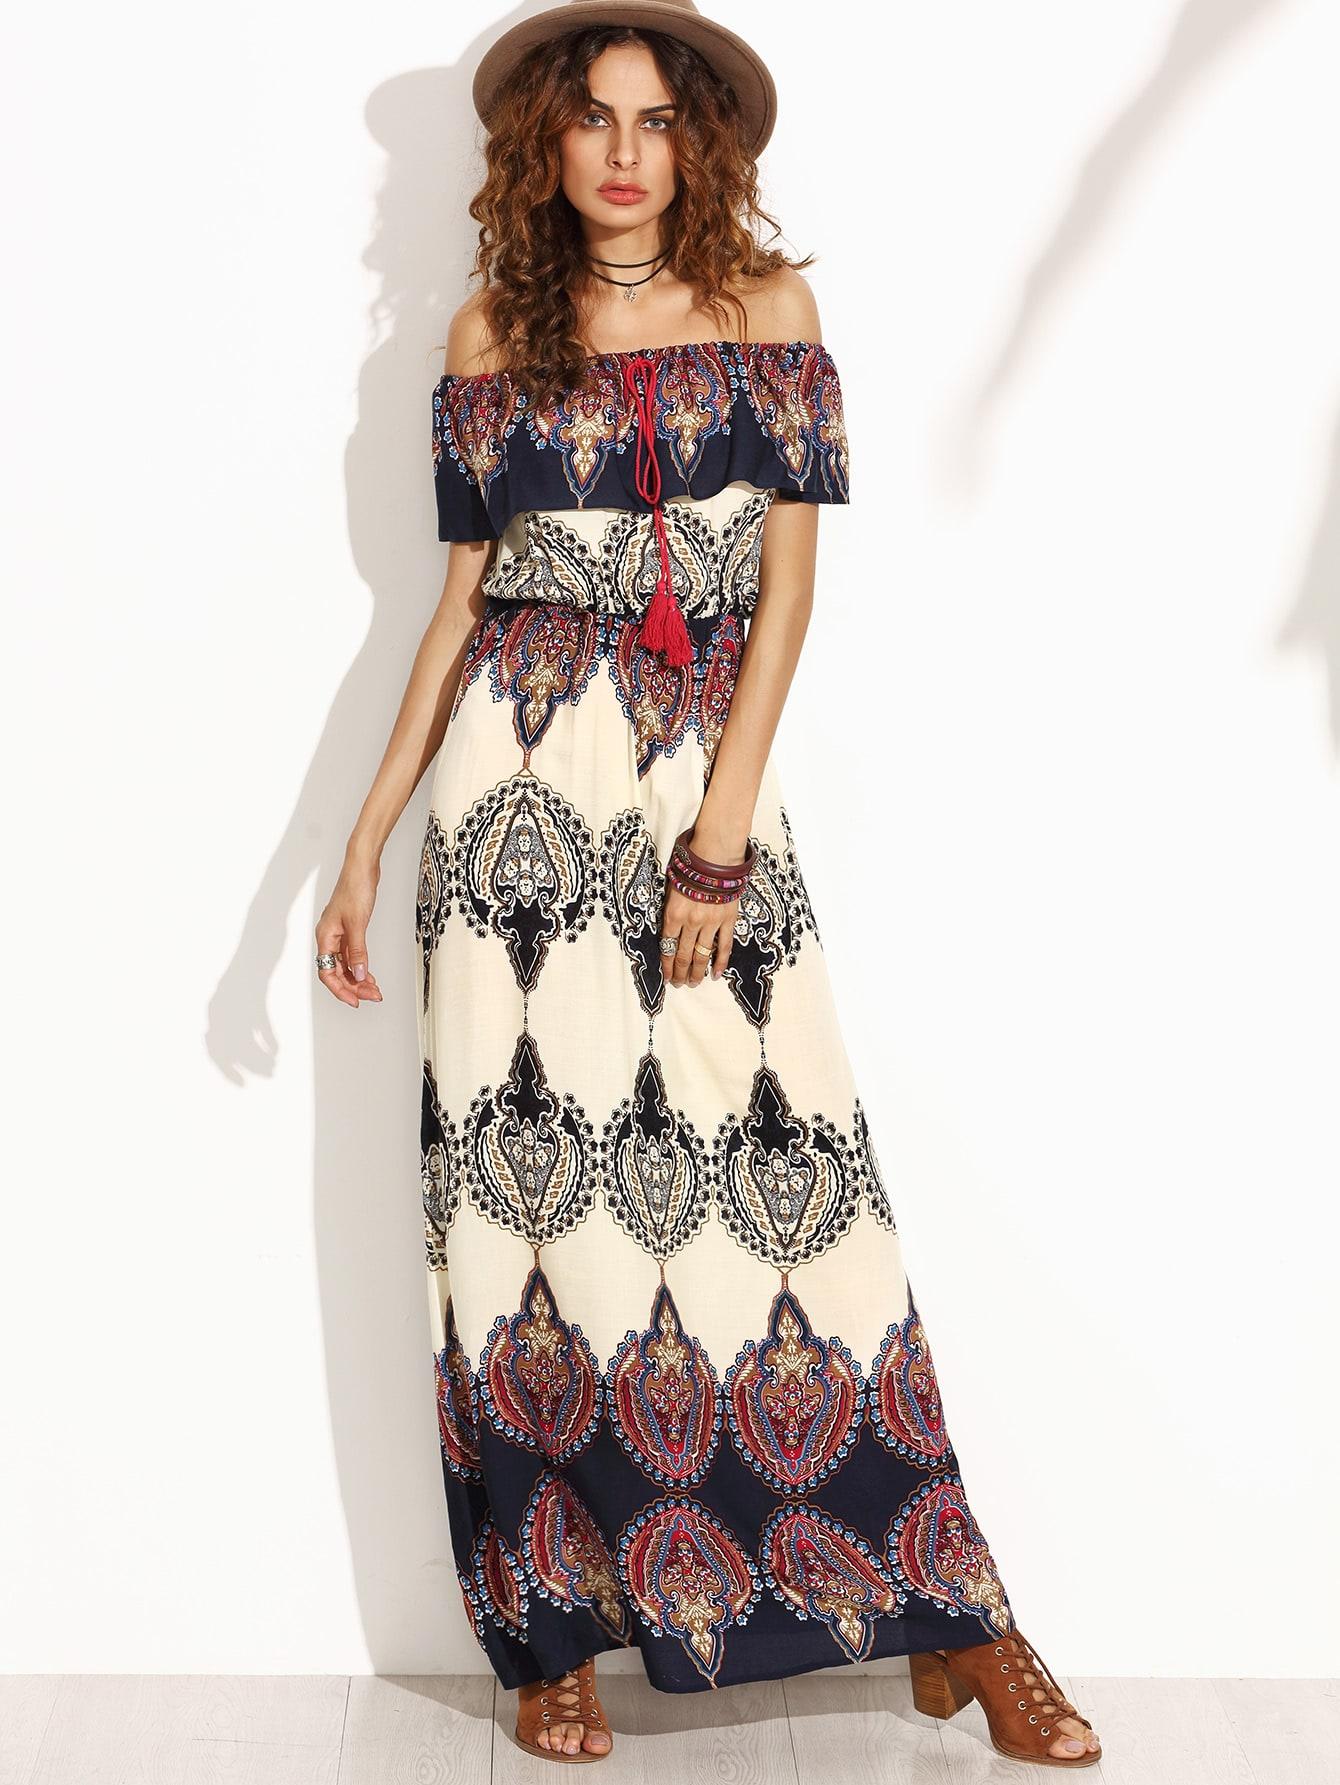 Bardot Print Self Tie Front Floor Length Dress